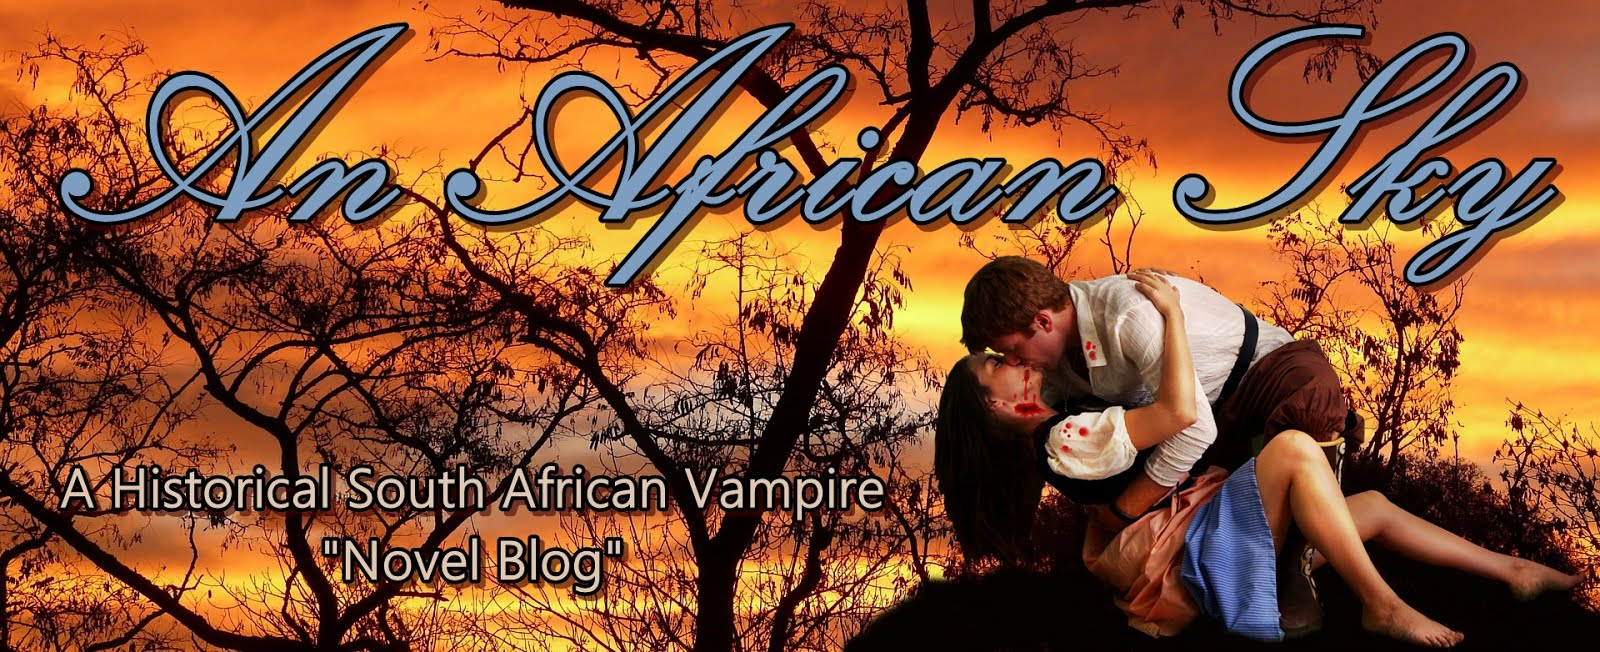 An African Sky - Vampire Historical Novel Blog